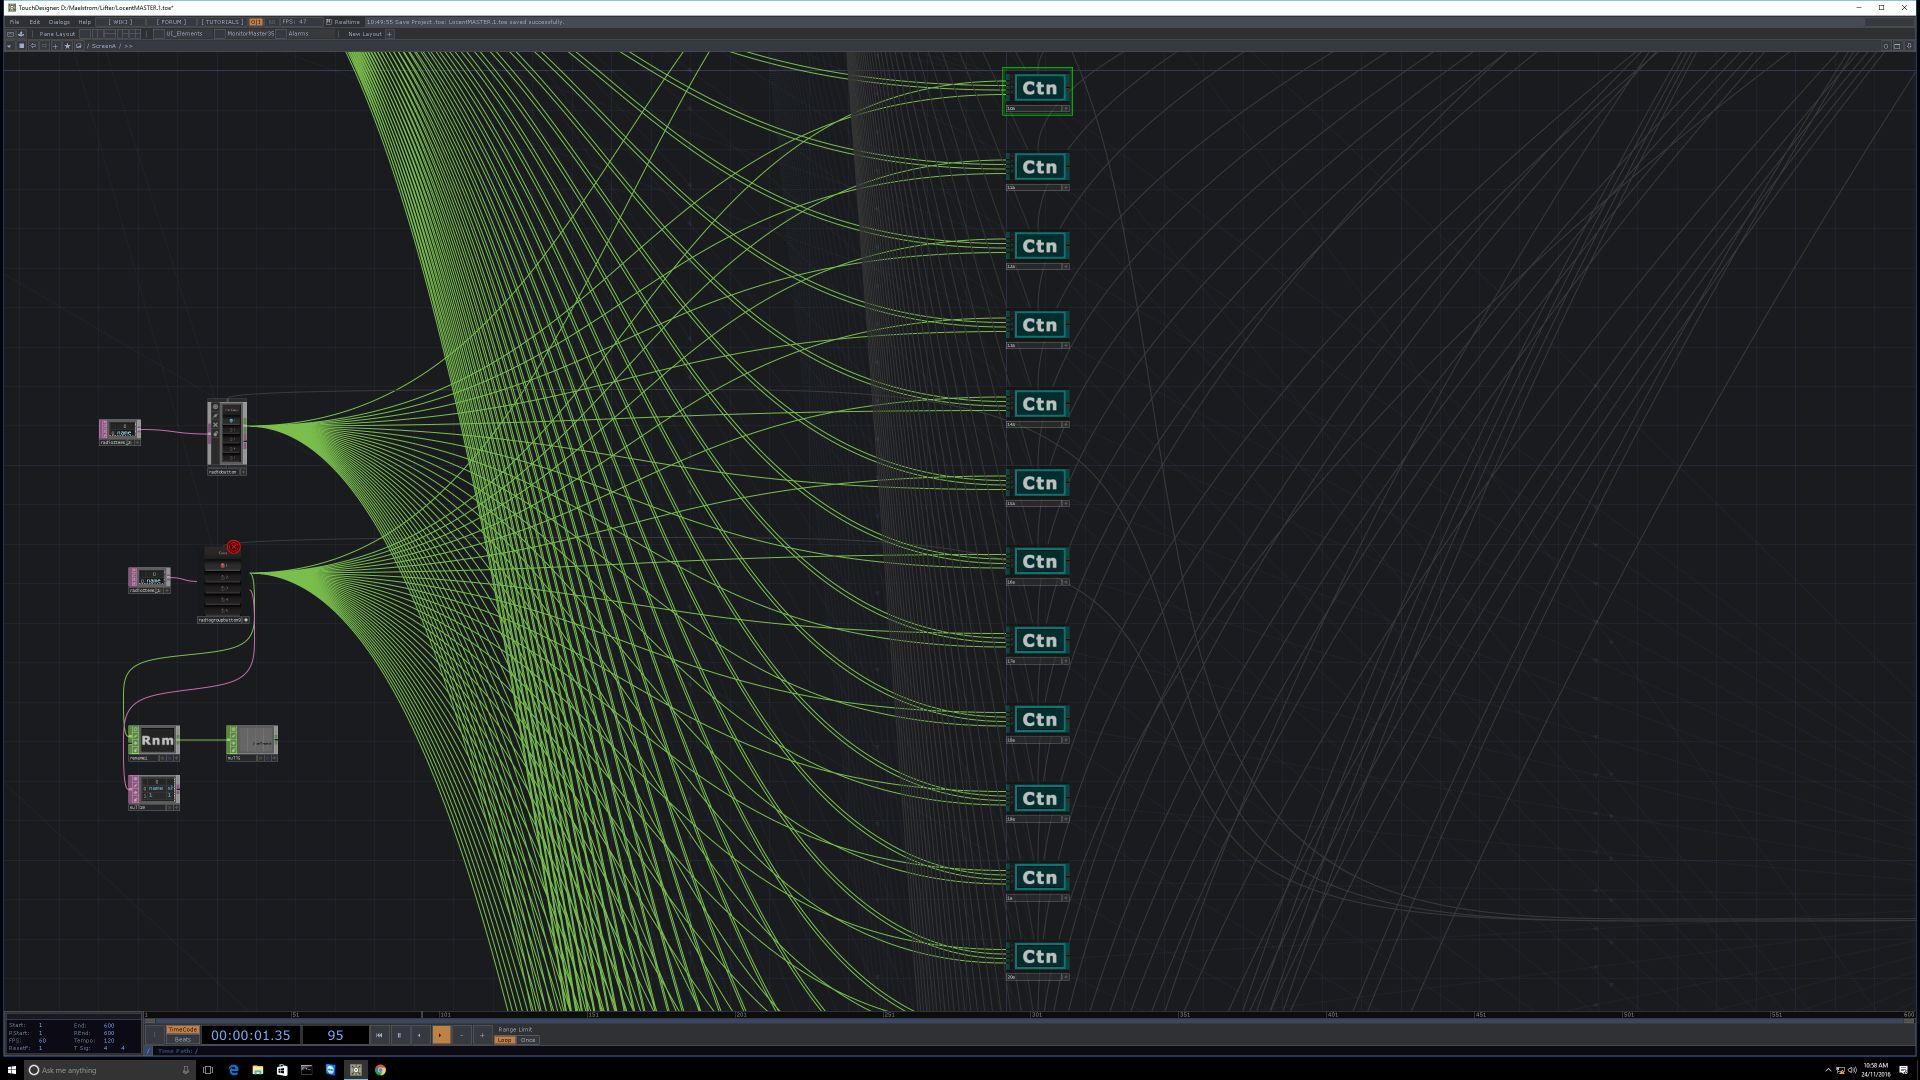 network_1920.jpg